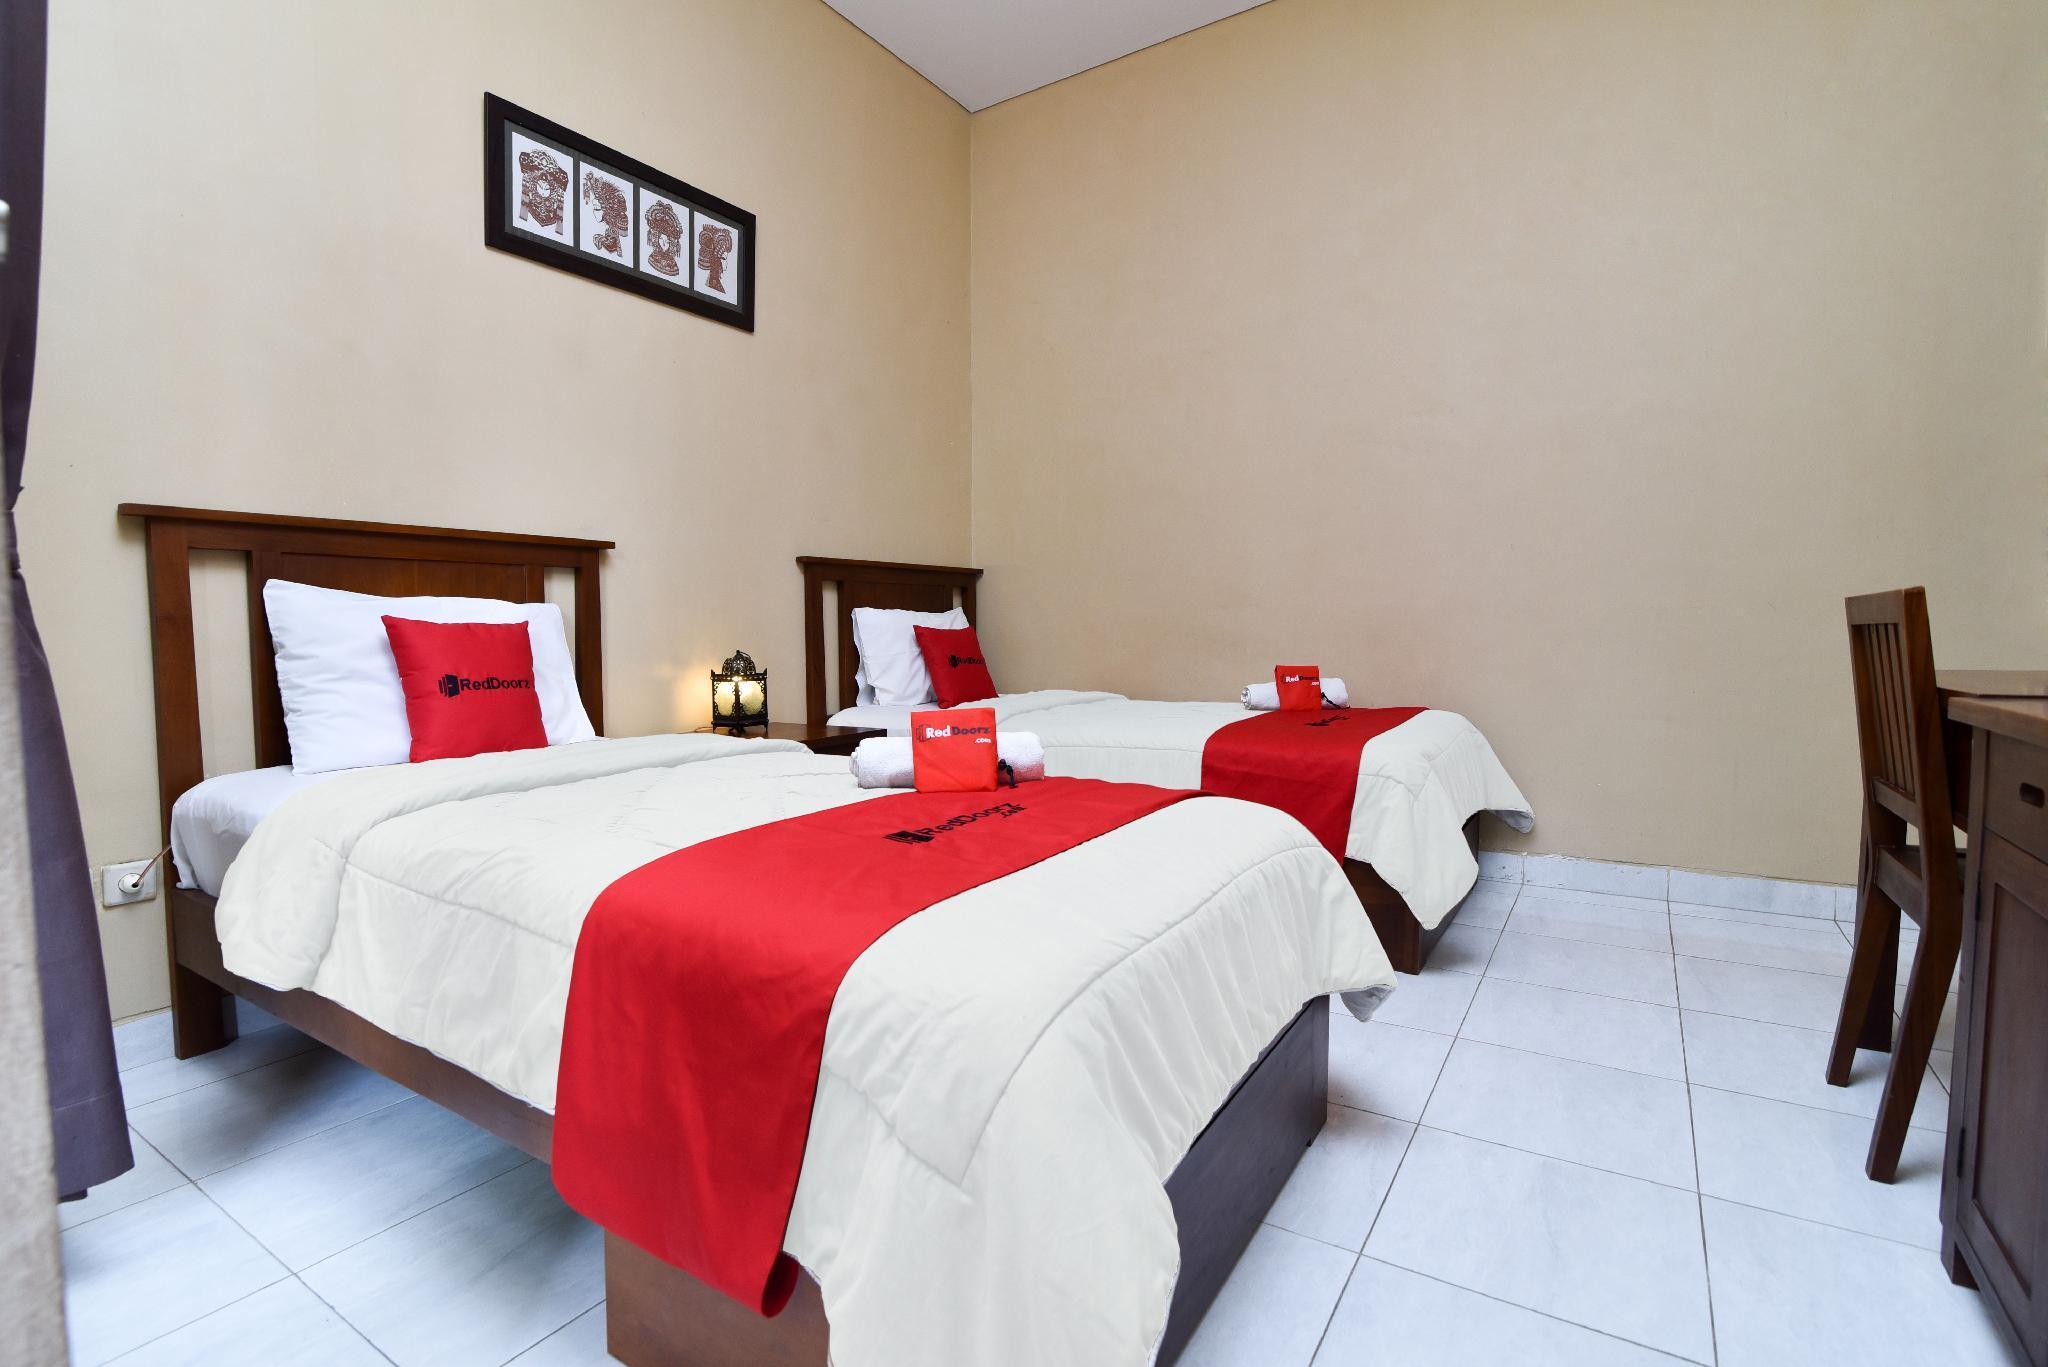 Reddoorz Near Pantai Sanur Bali Guesthouse Bed And Breakfast Deals Photos Reviews